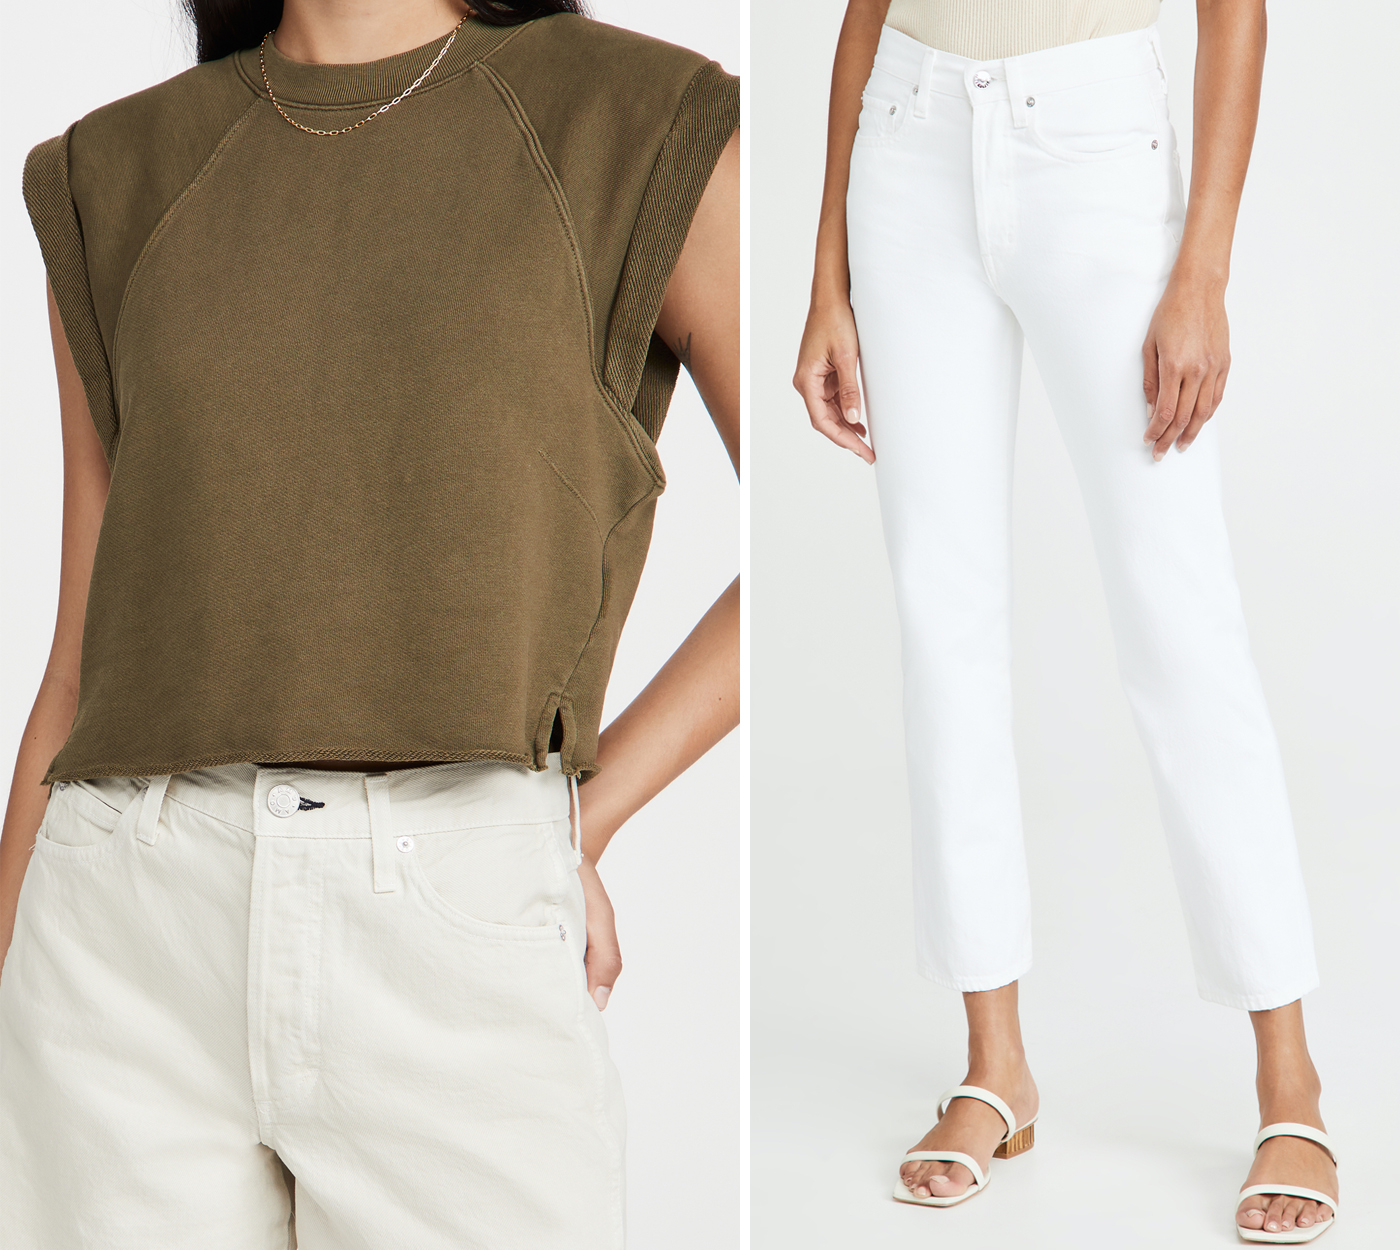 shopbop rolled sleeveless sweatshirt, white jeans